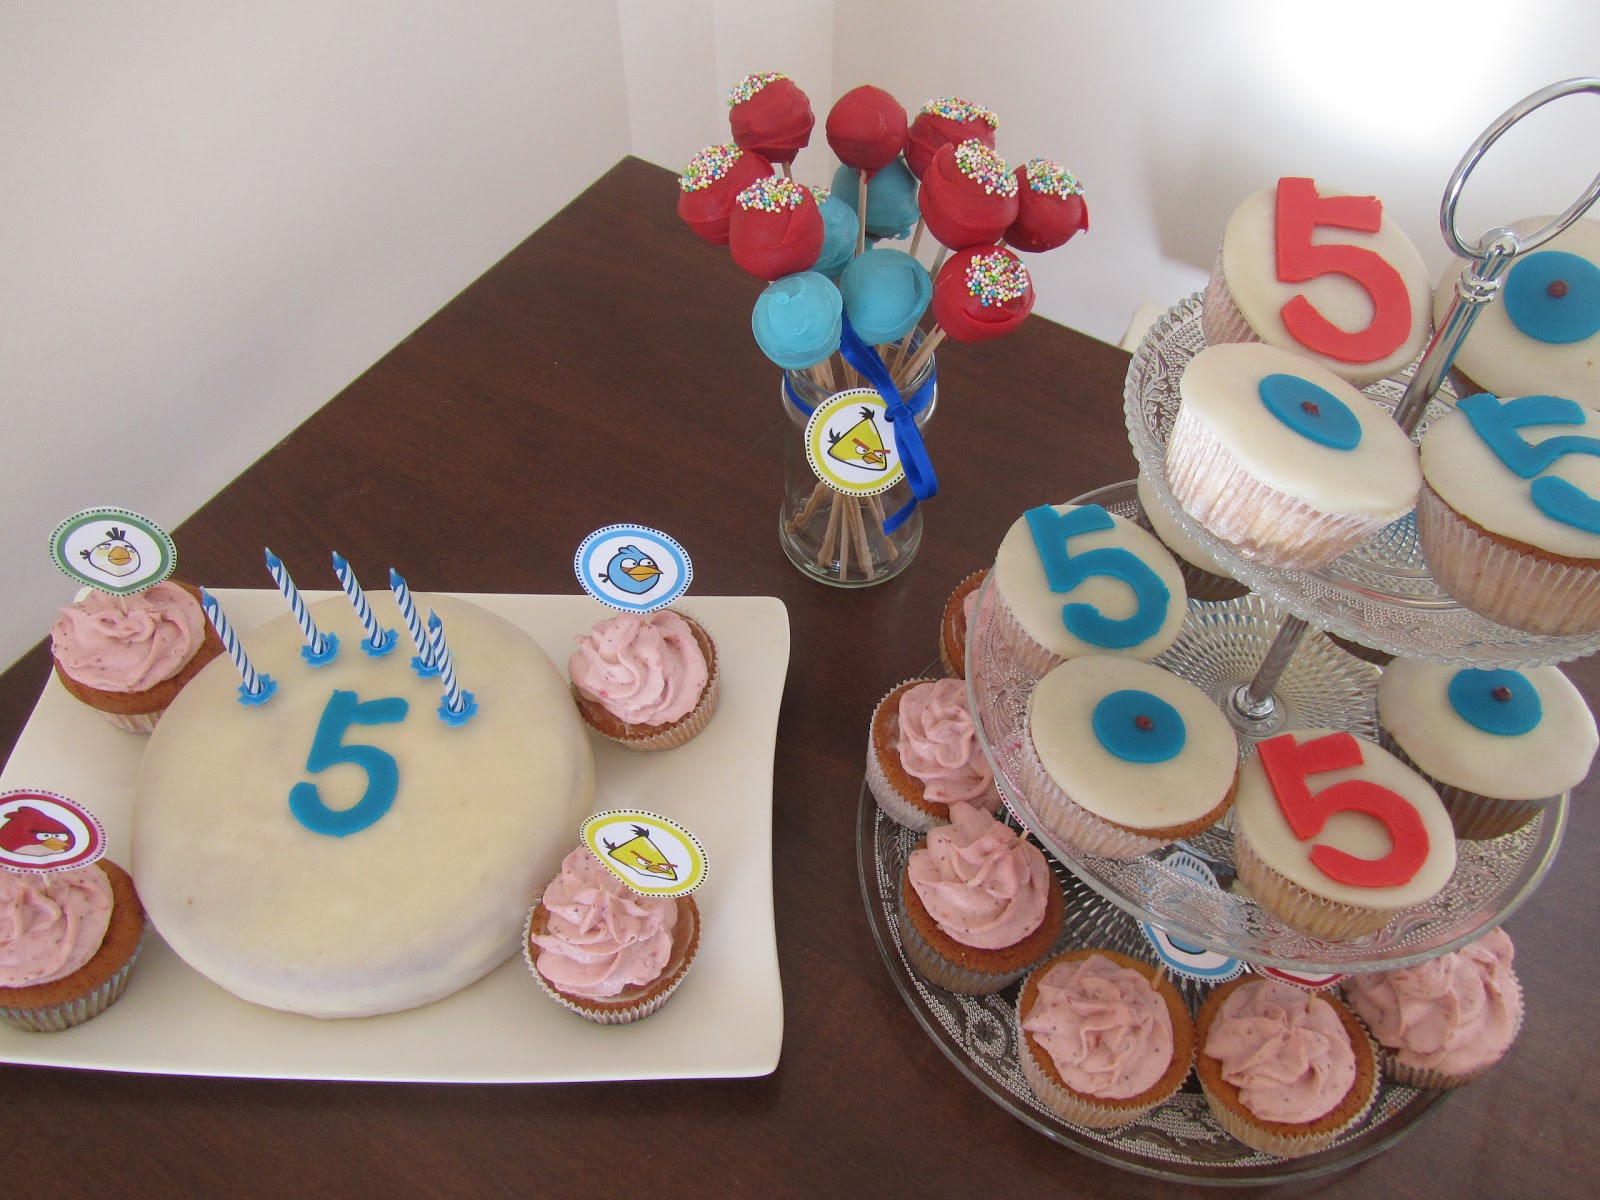 Franci s cupcakes robin s geburtstag - Cake pops 50 geburtstag ...